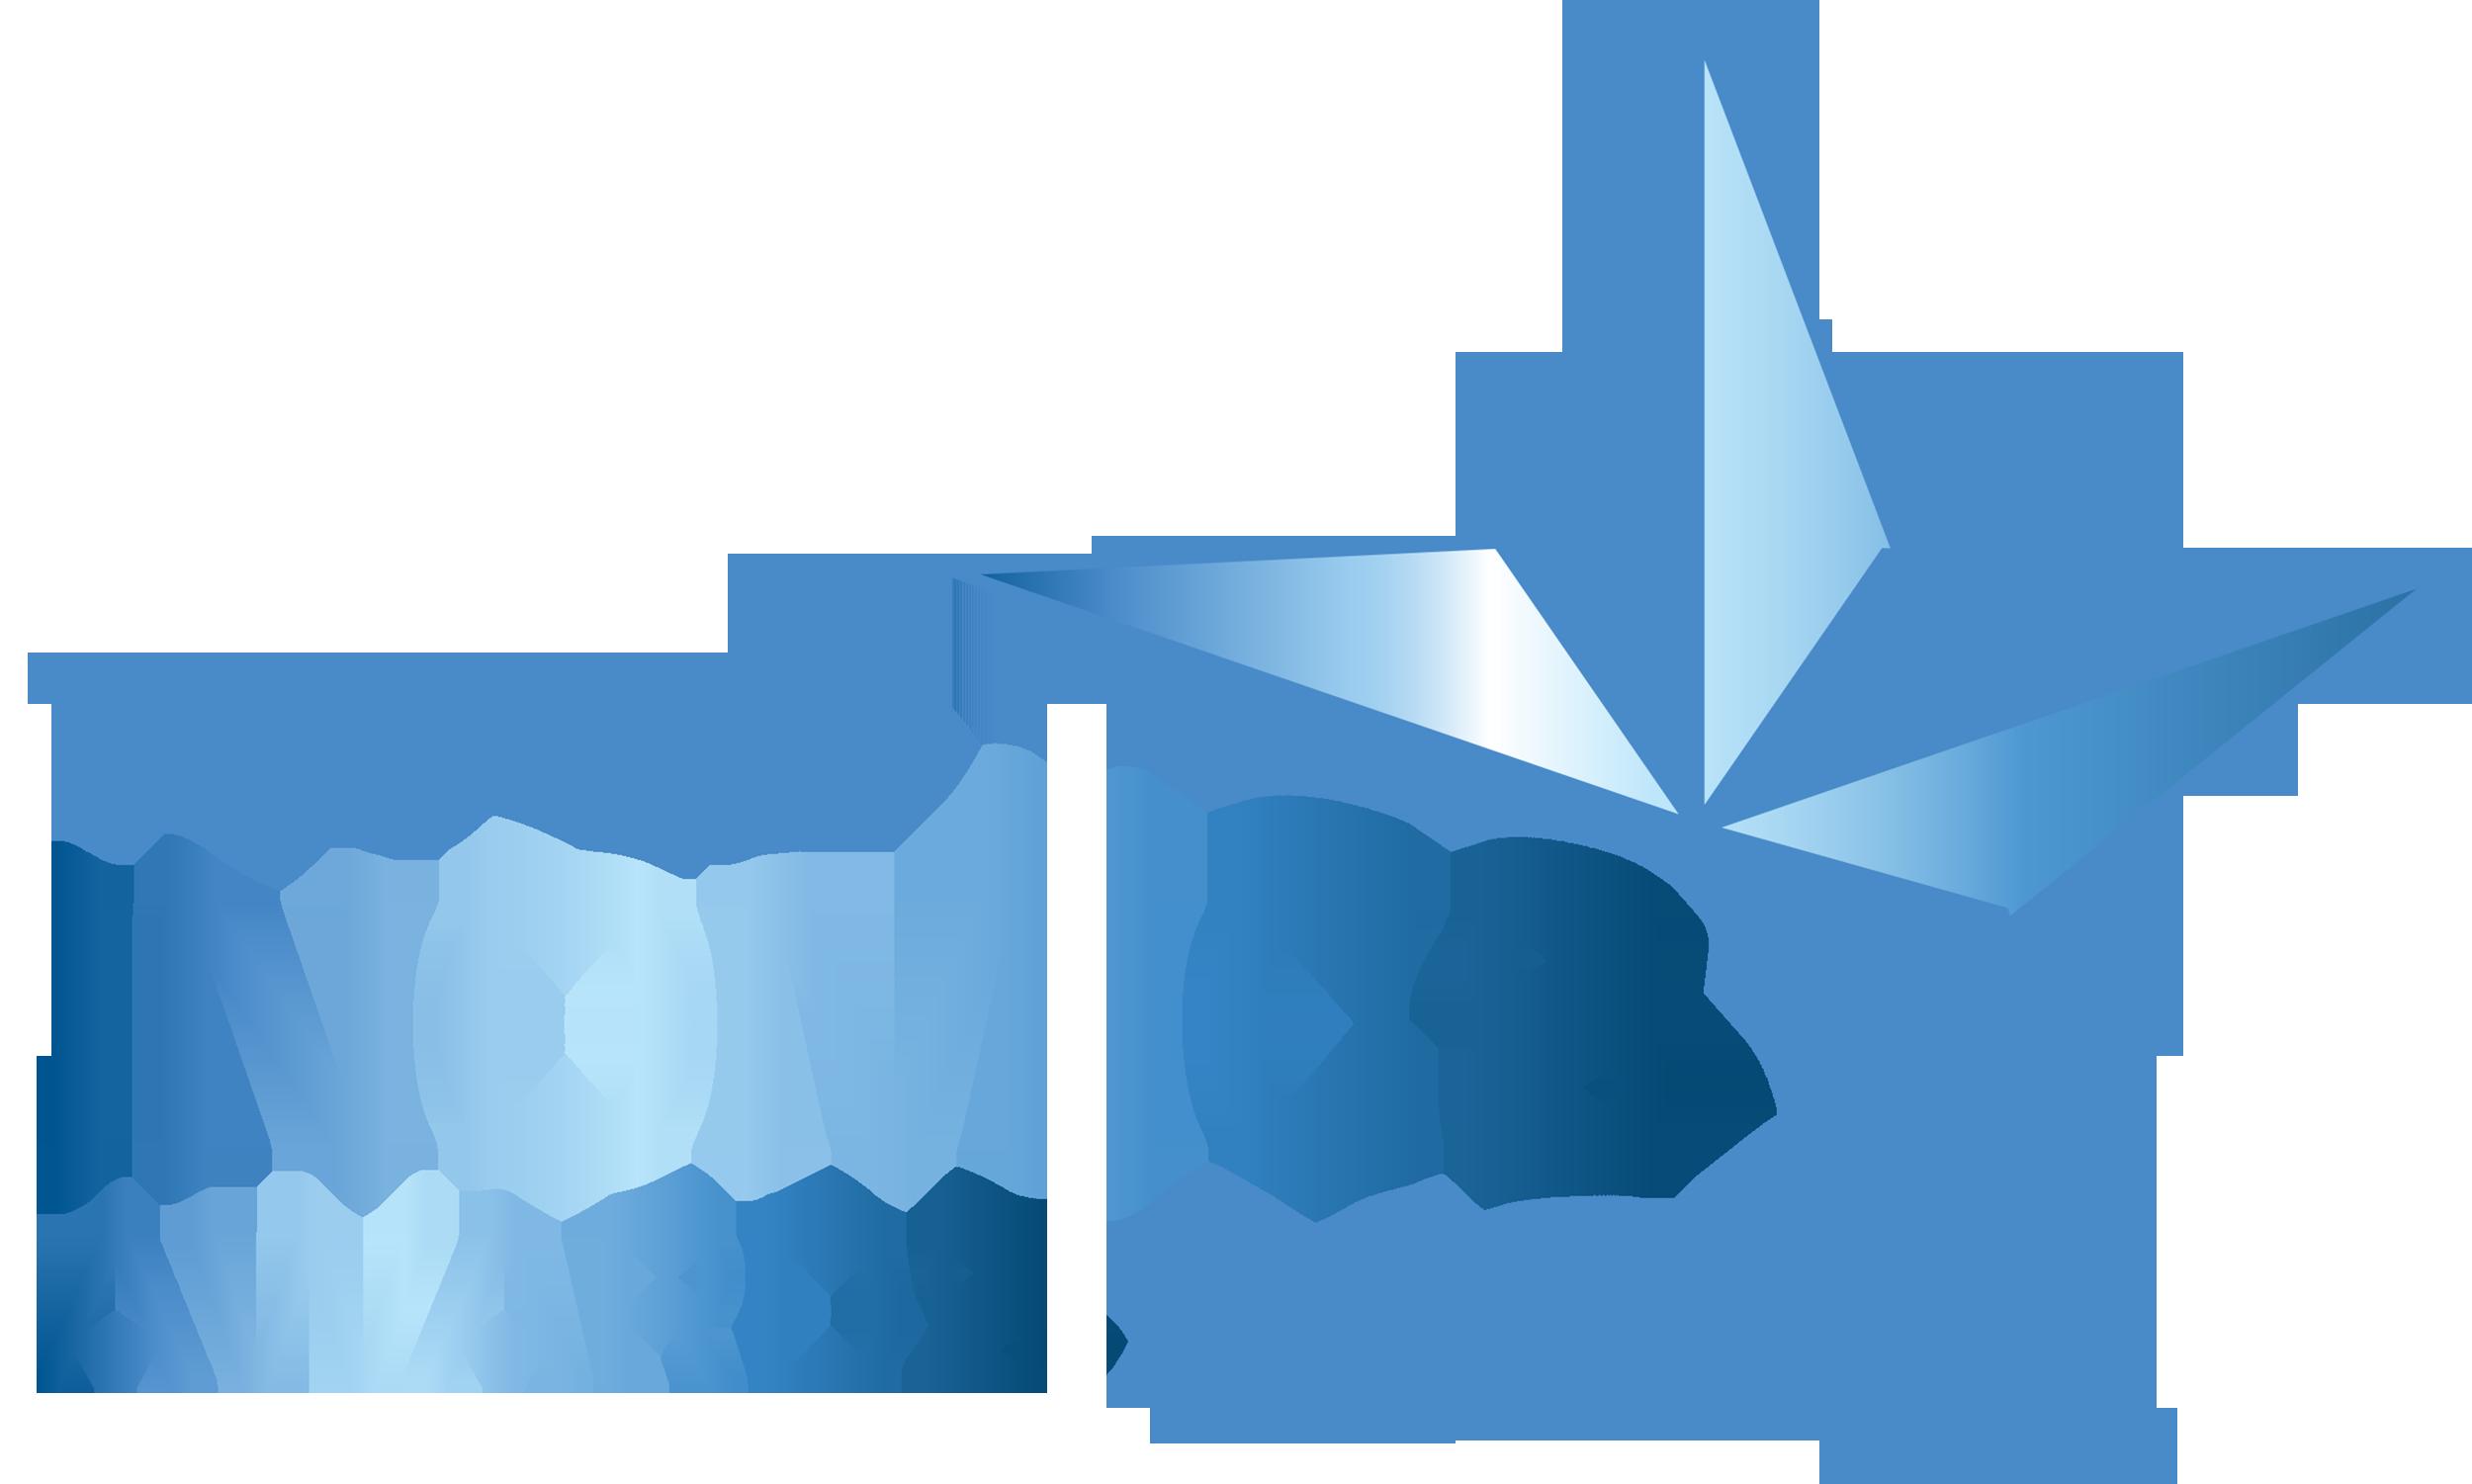 INOMICS Awards 2021 - Top 20 Notable Mentions